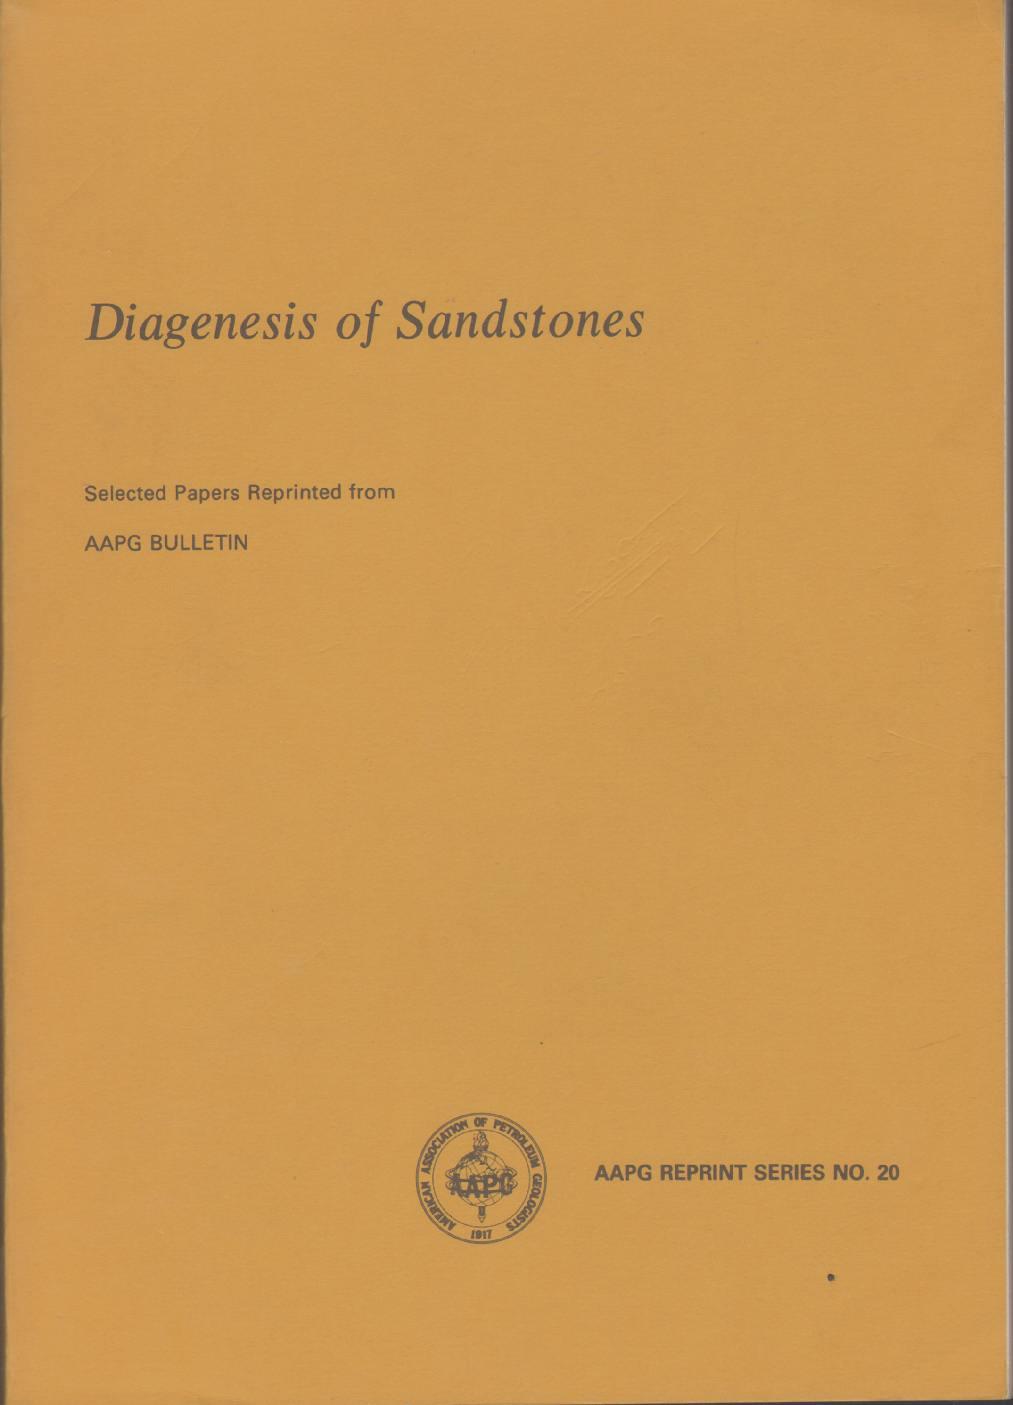 Image for DIAGENESIS OF SANDSTONE AAPG Reprint Series No. 20